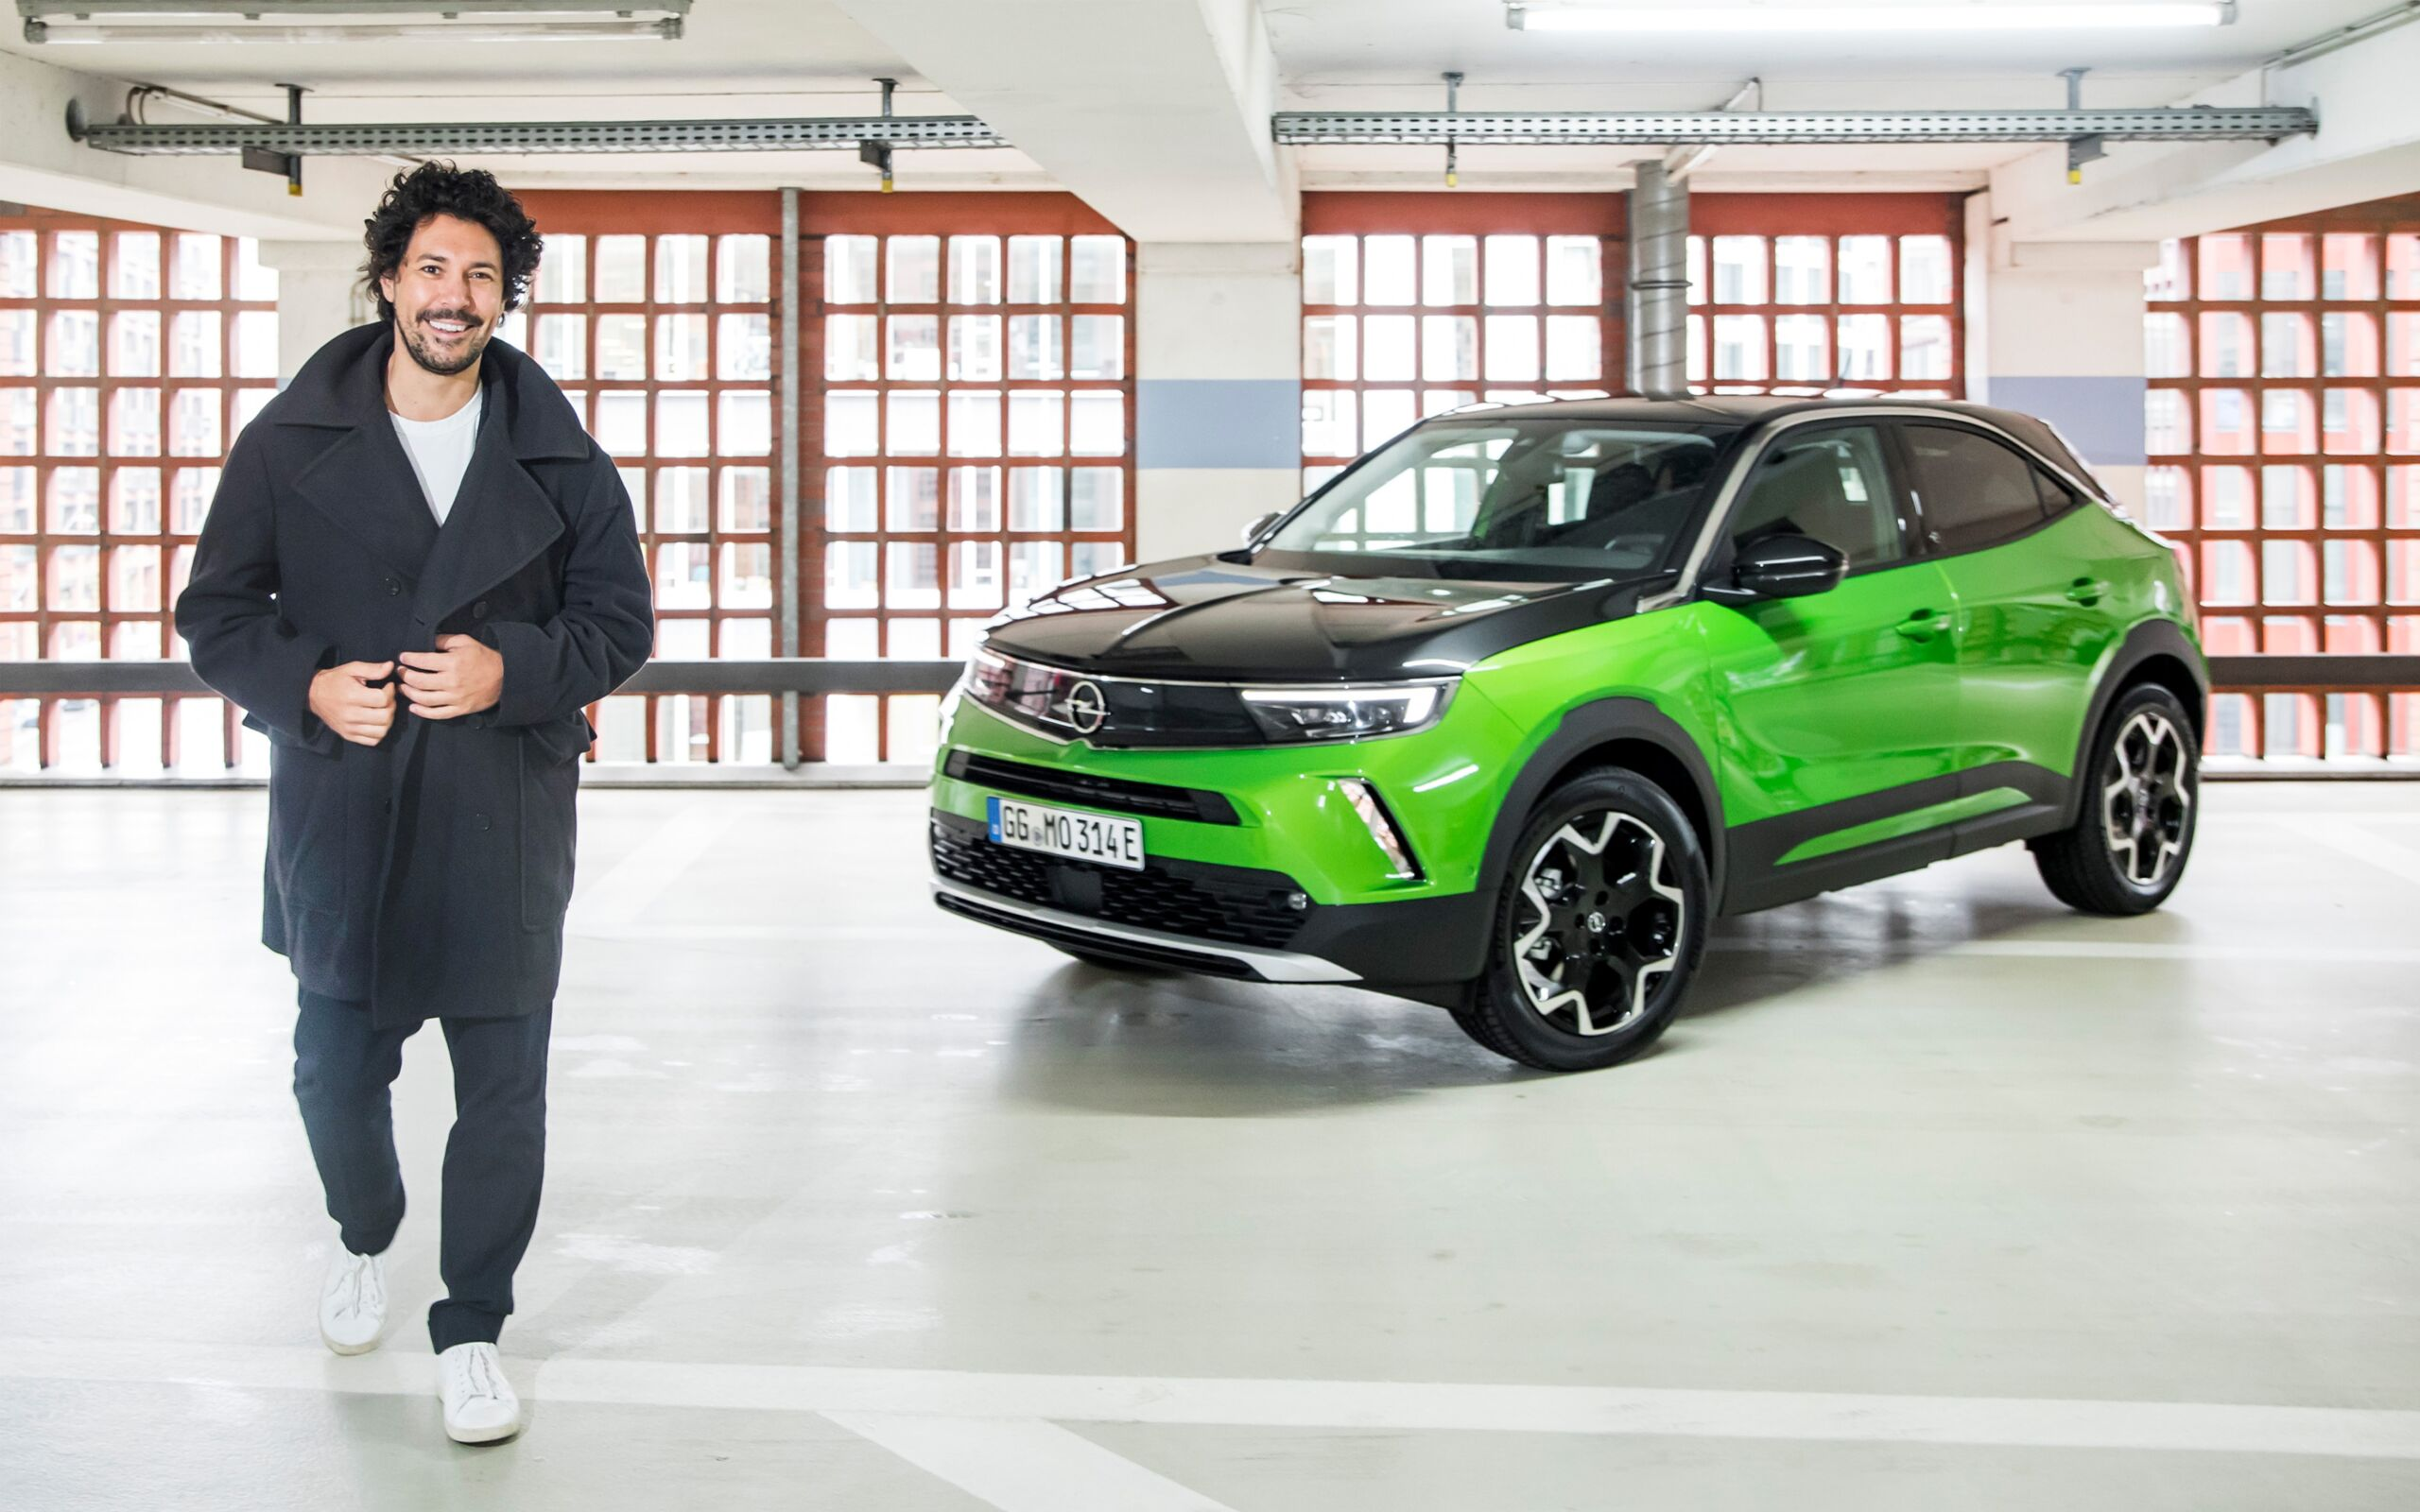 Nuovo Opel Mokka esperti stile